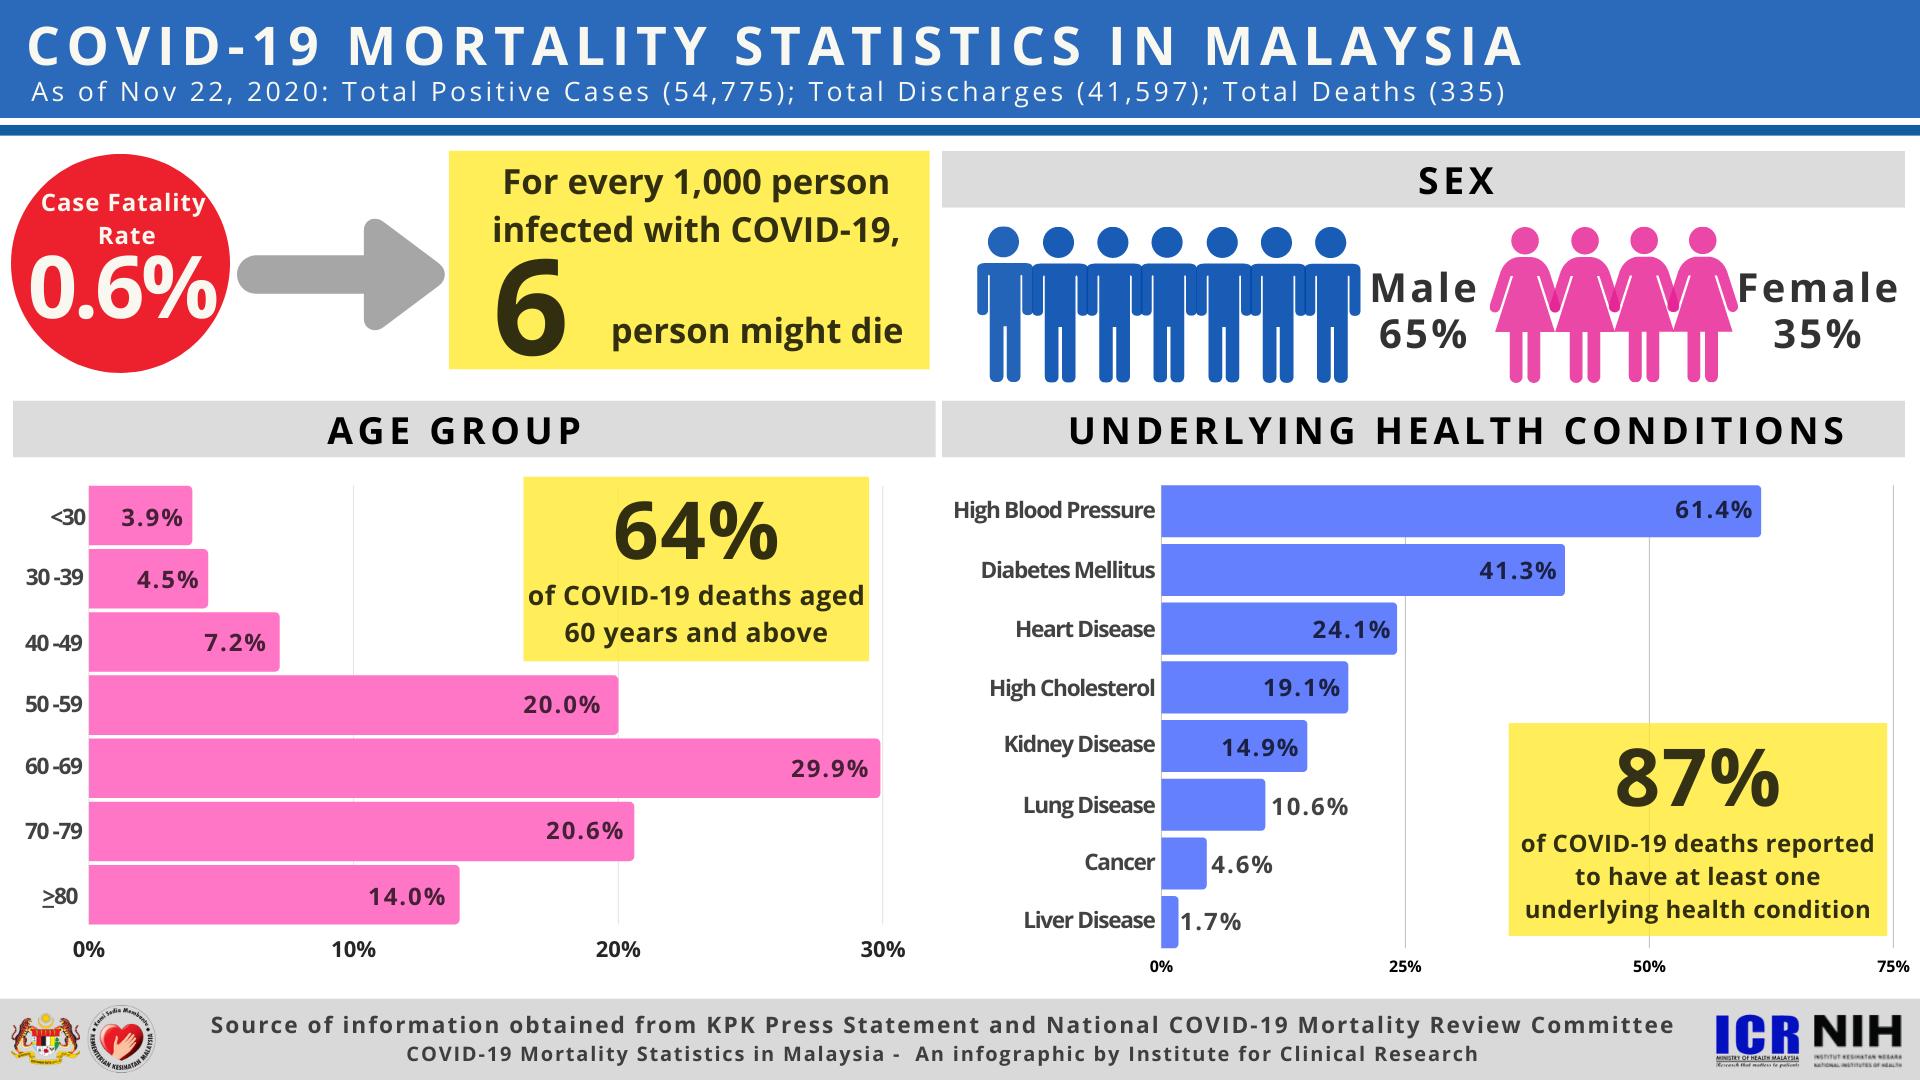 COVID-19 Mortality Statistics in Malaysia (As of Nov 22, 2020)